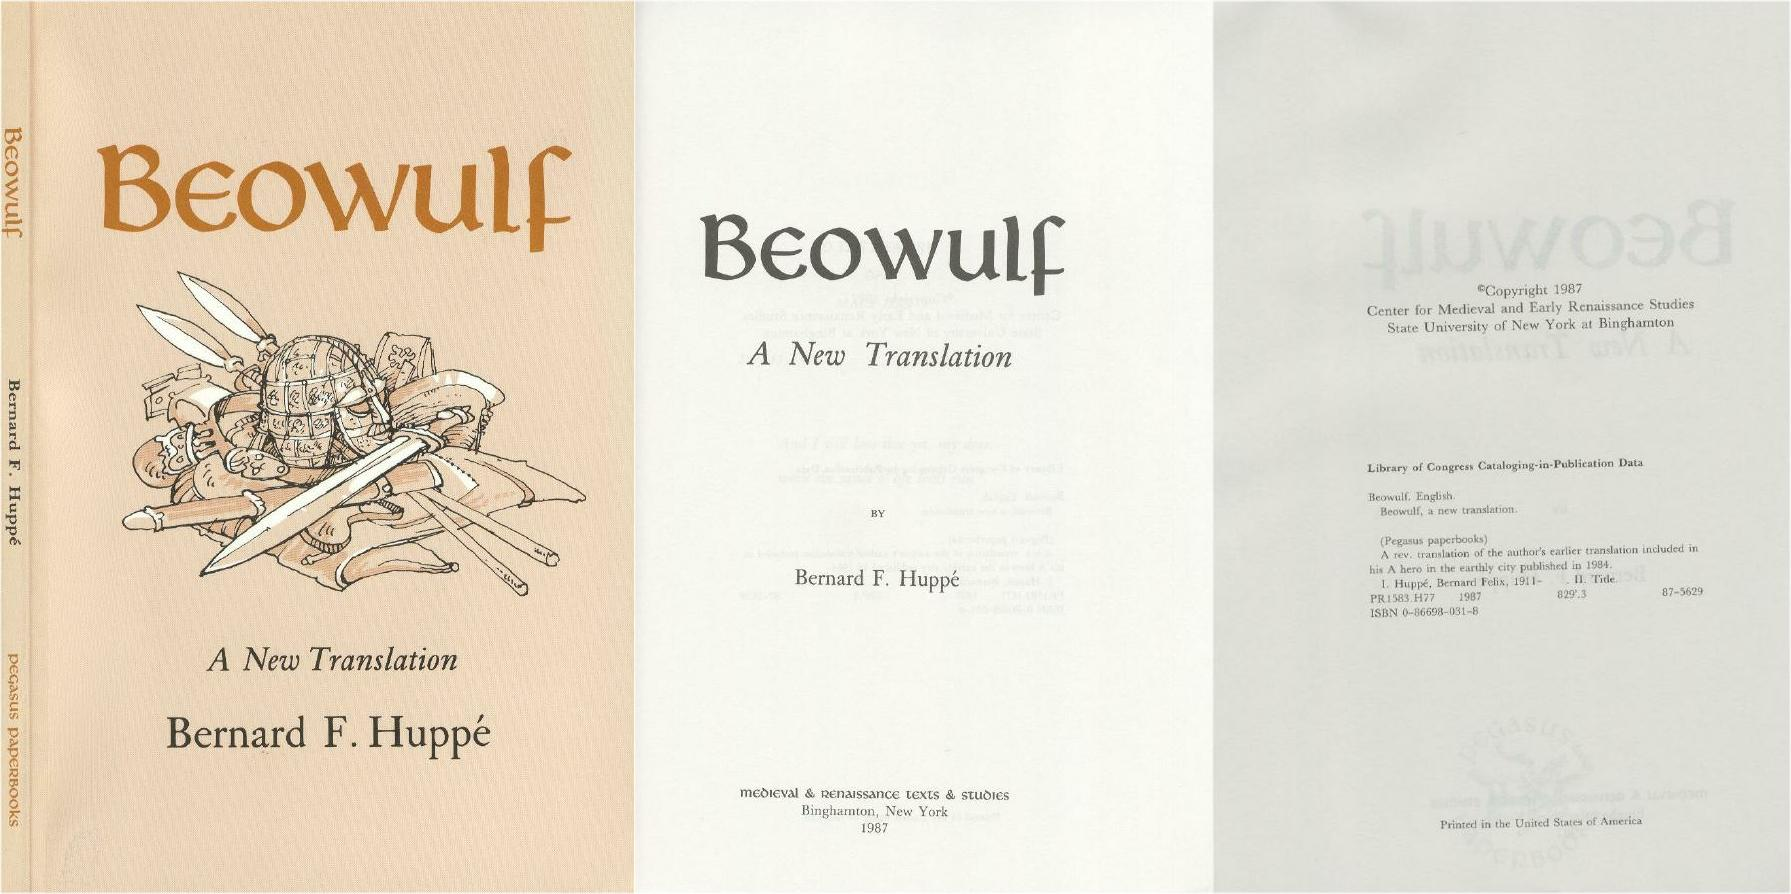 Beowulftranslations Net Translations By Bernard F Huppe border=